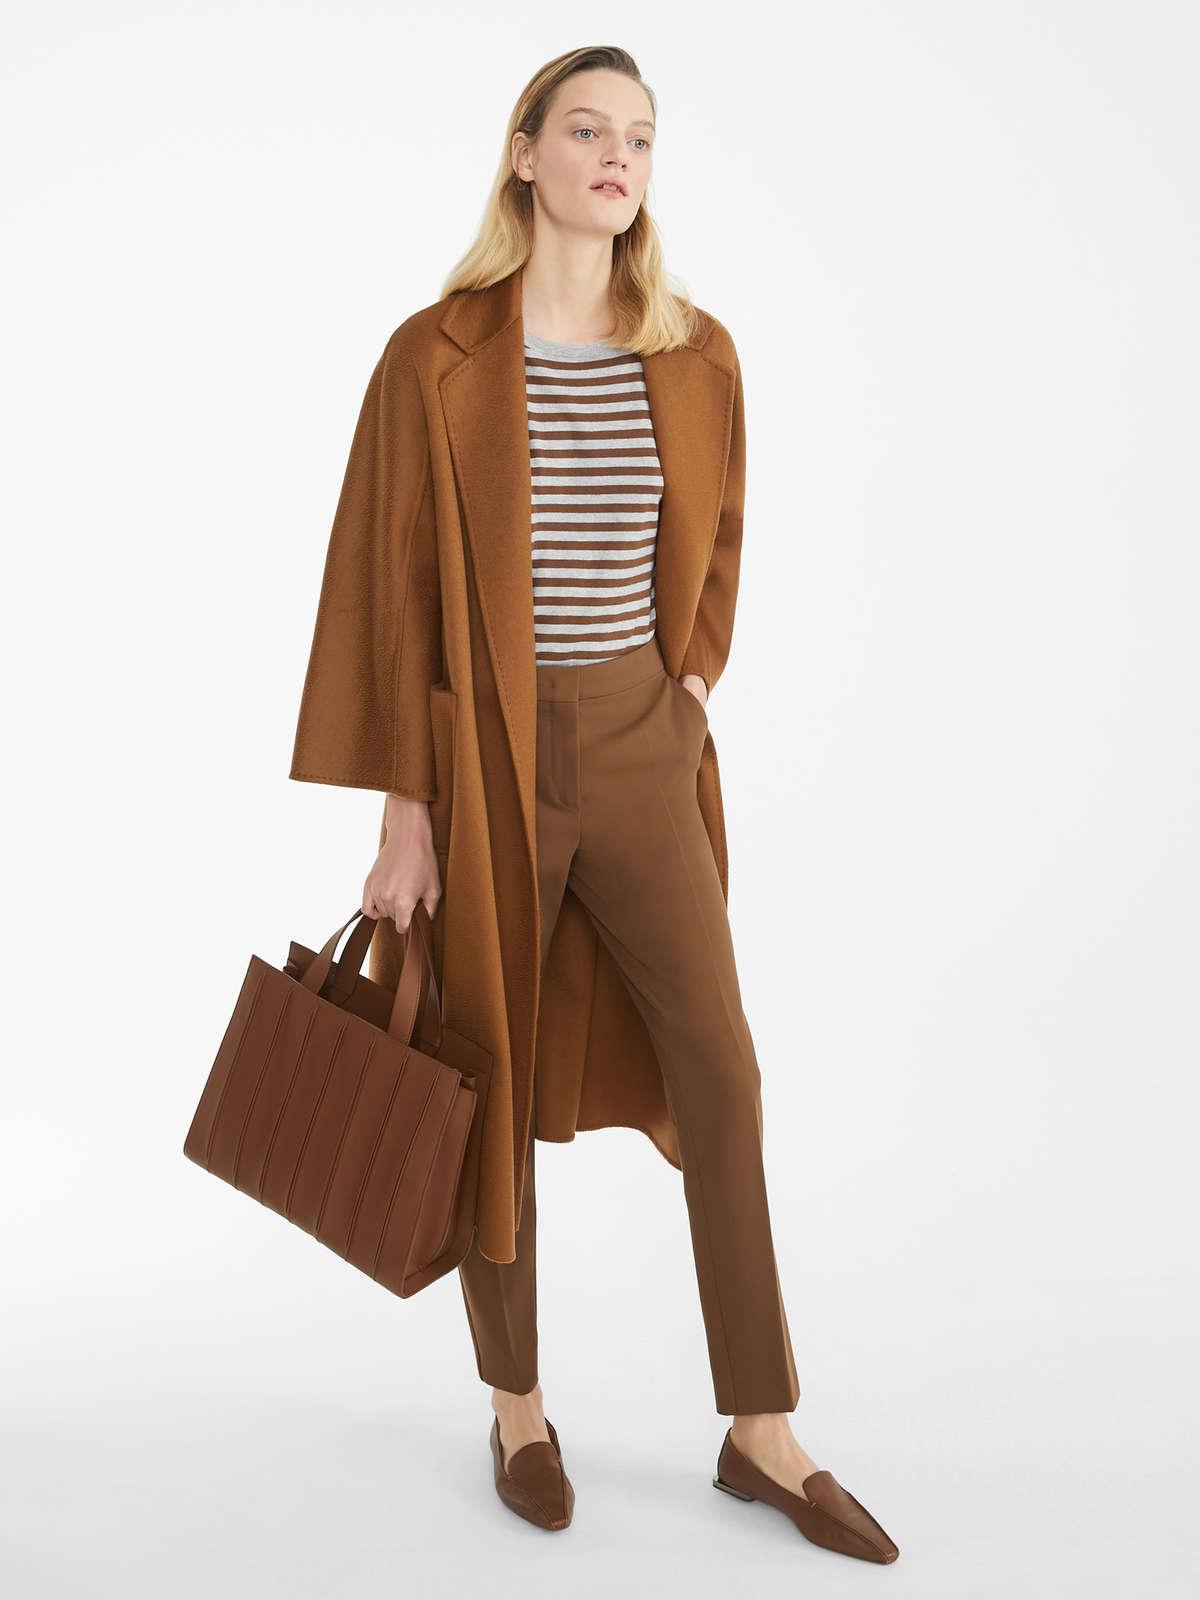 Cashmere Coat - Max Mara